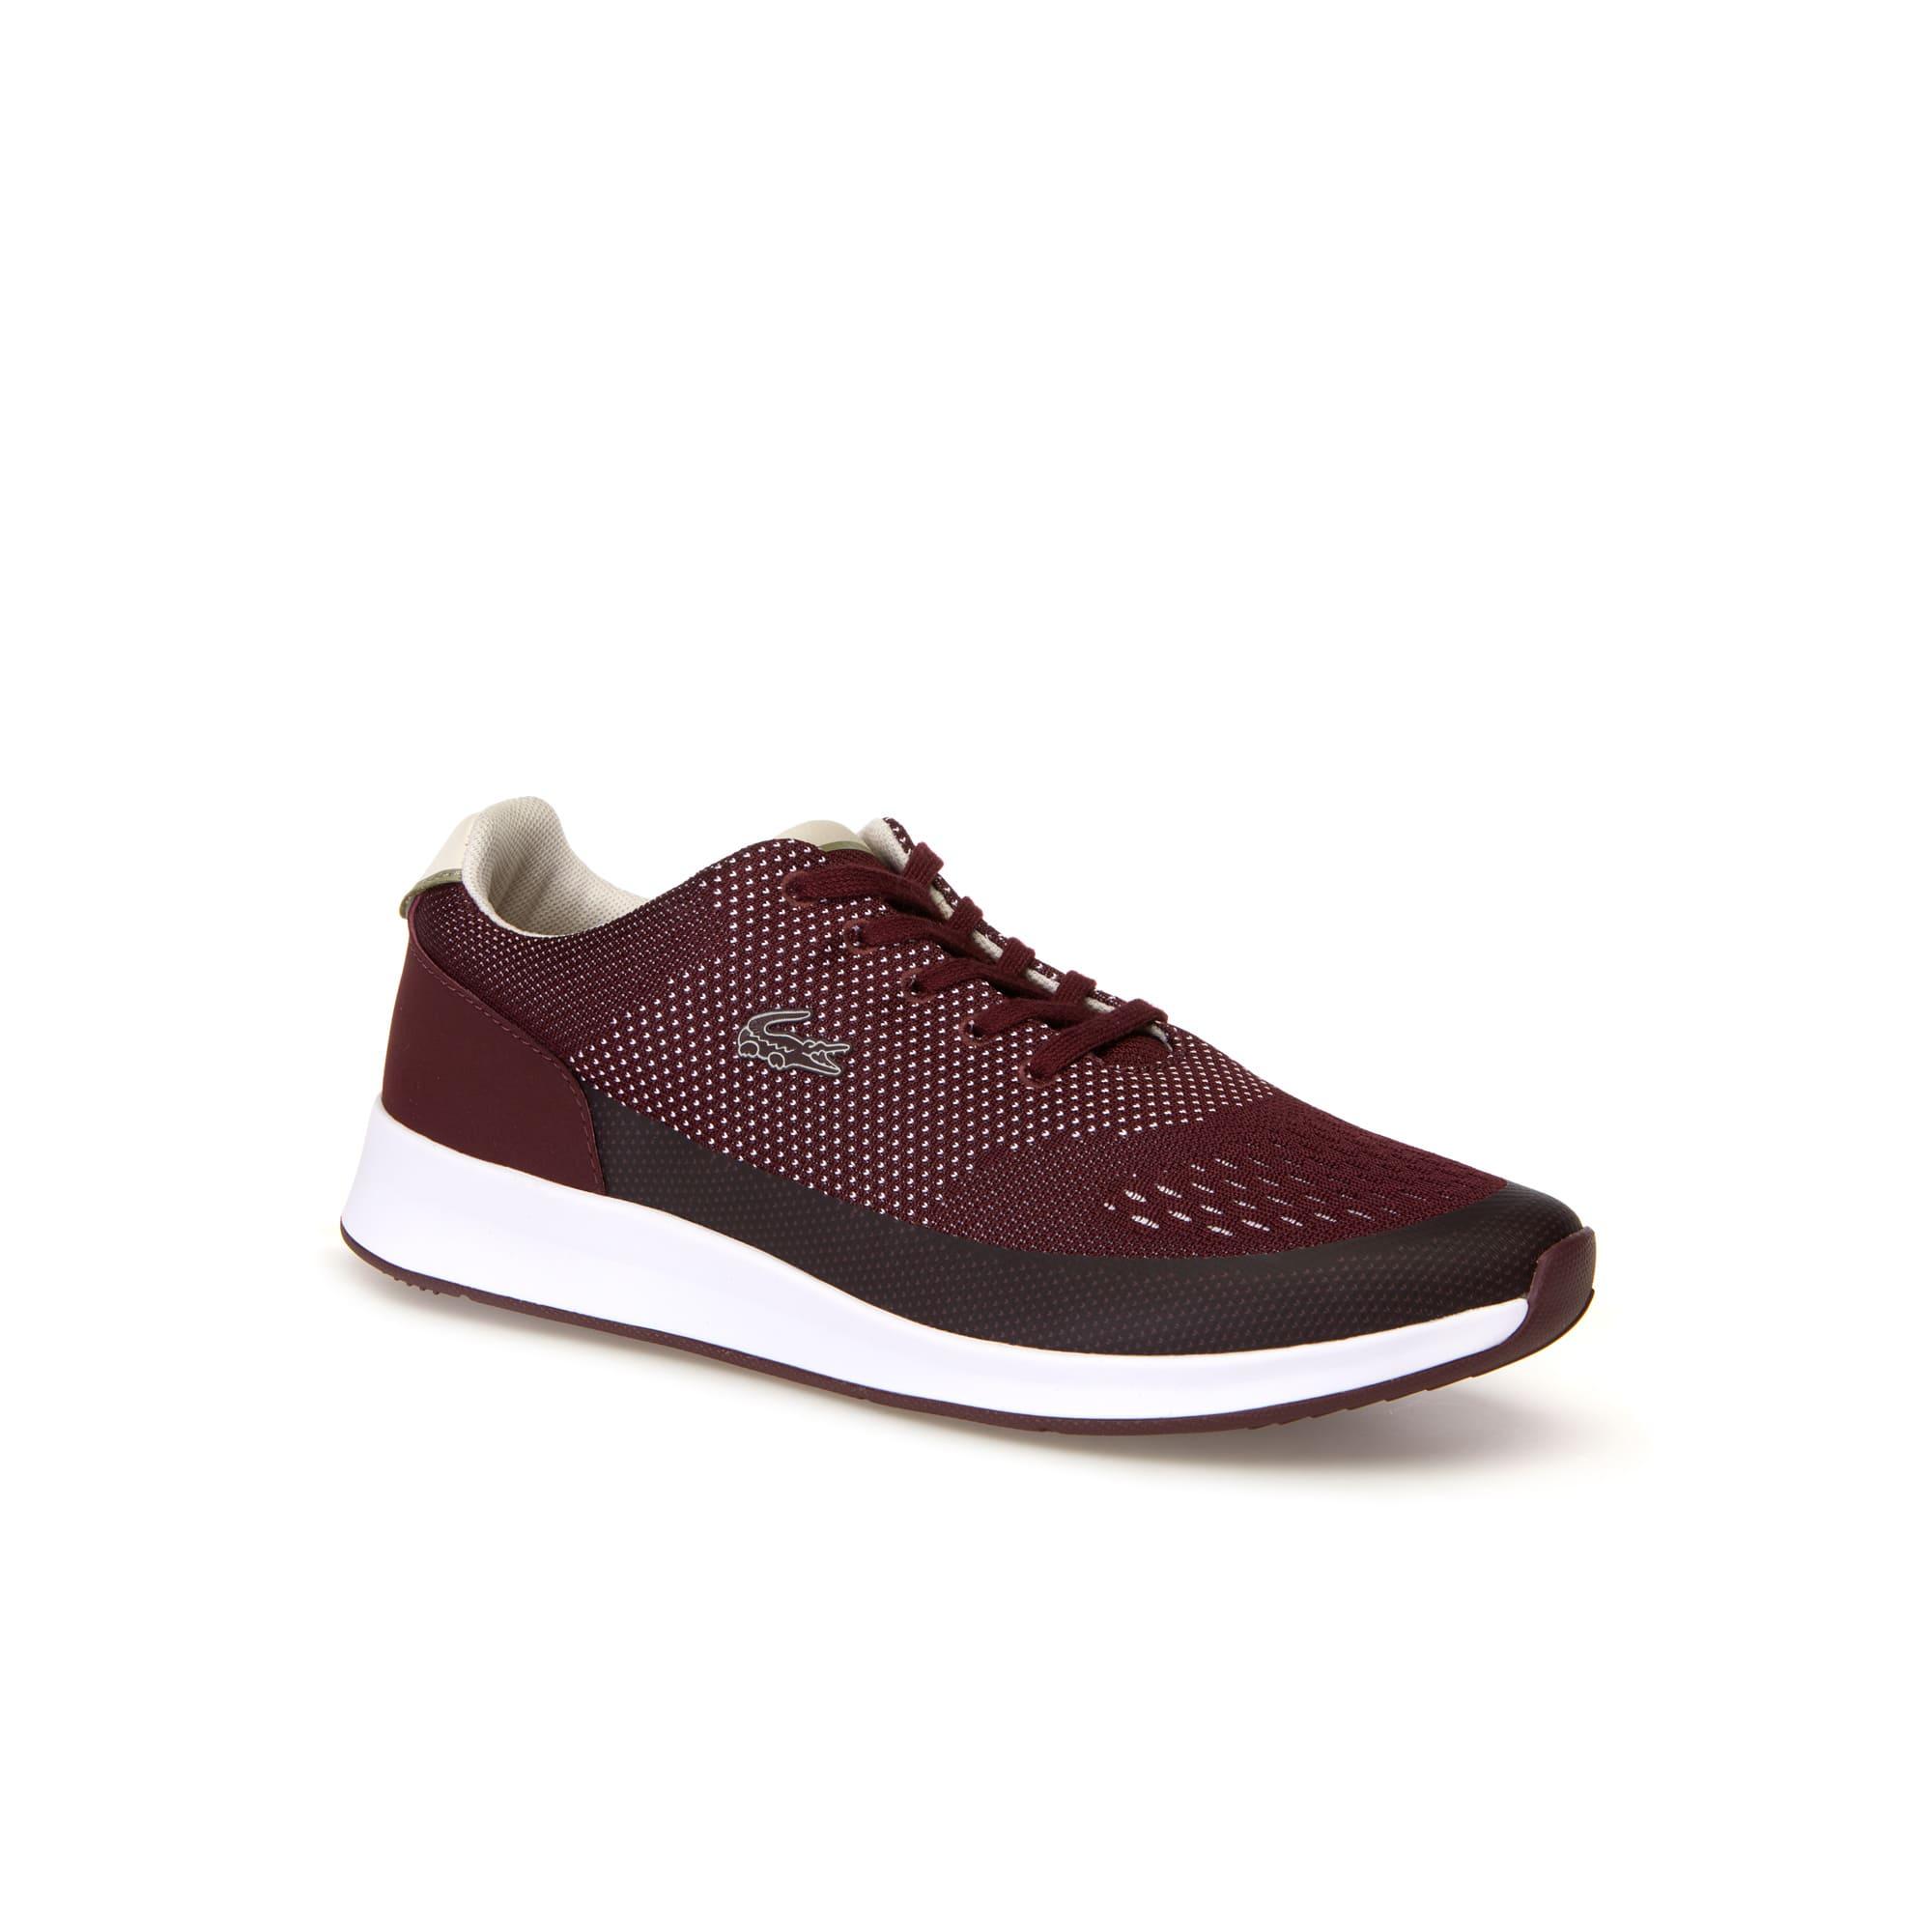 Damen-Sneakers CHAUMONT aus Jacquard-Strick